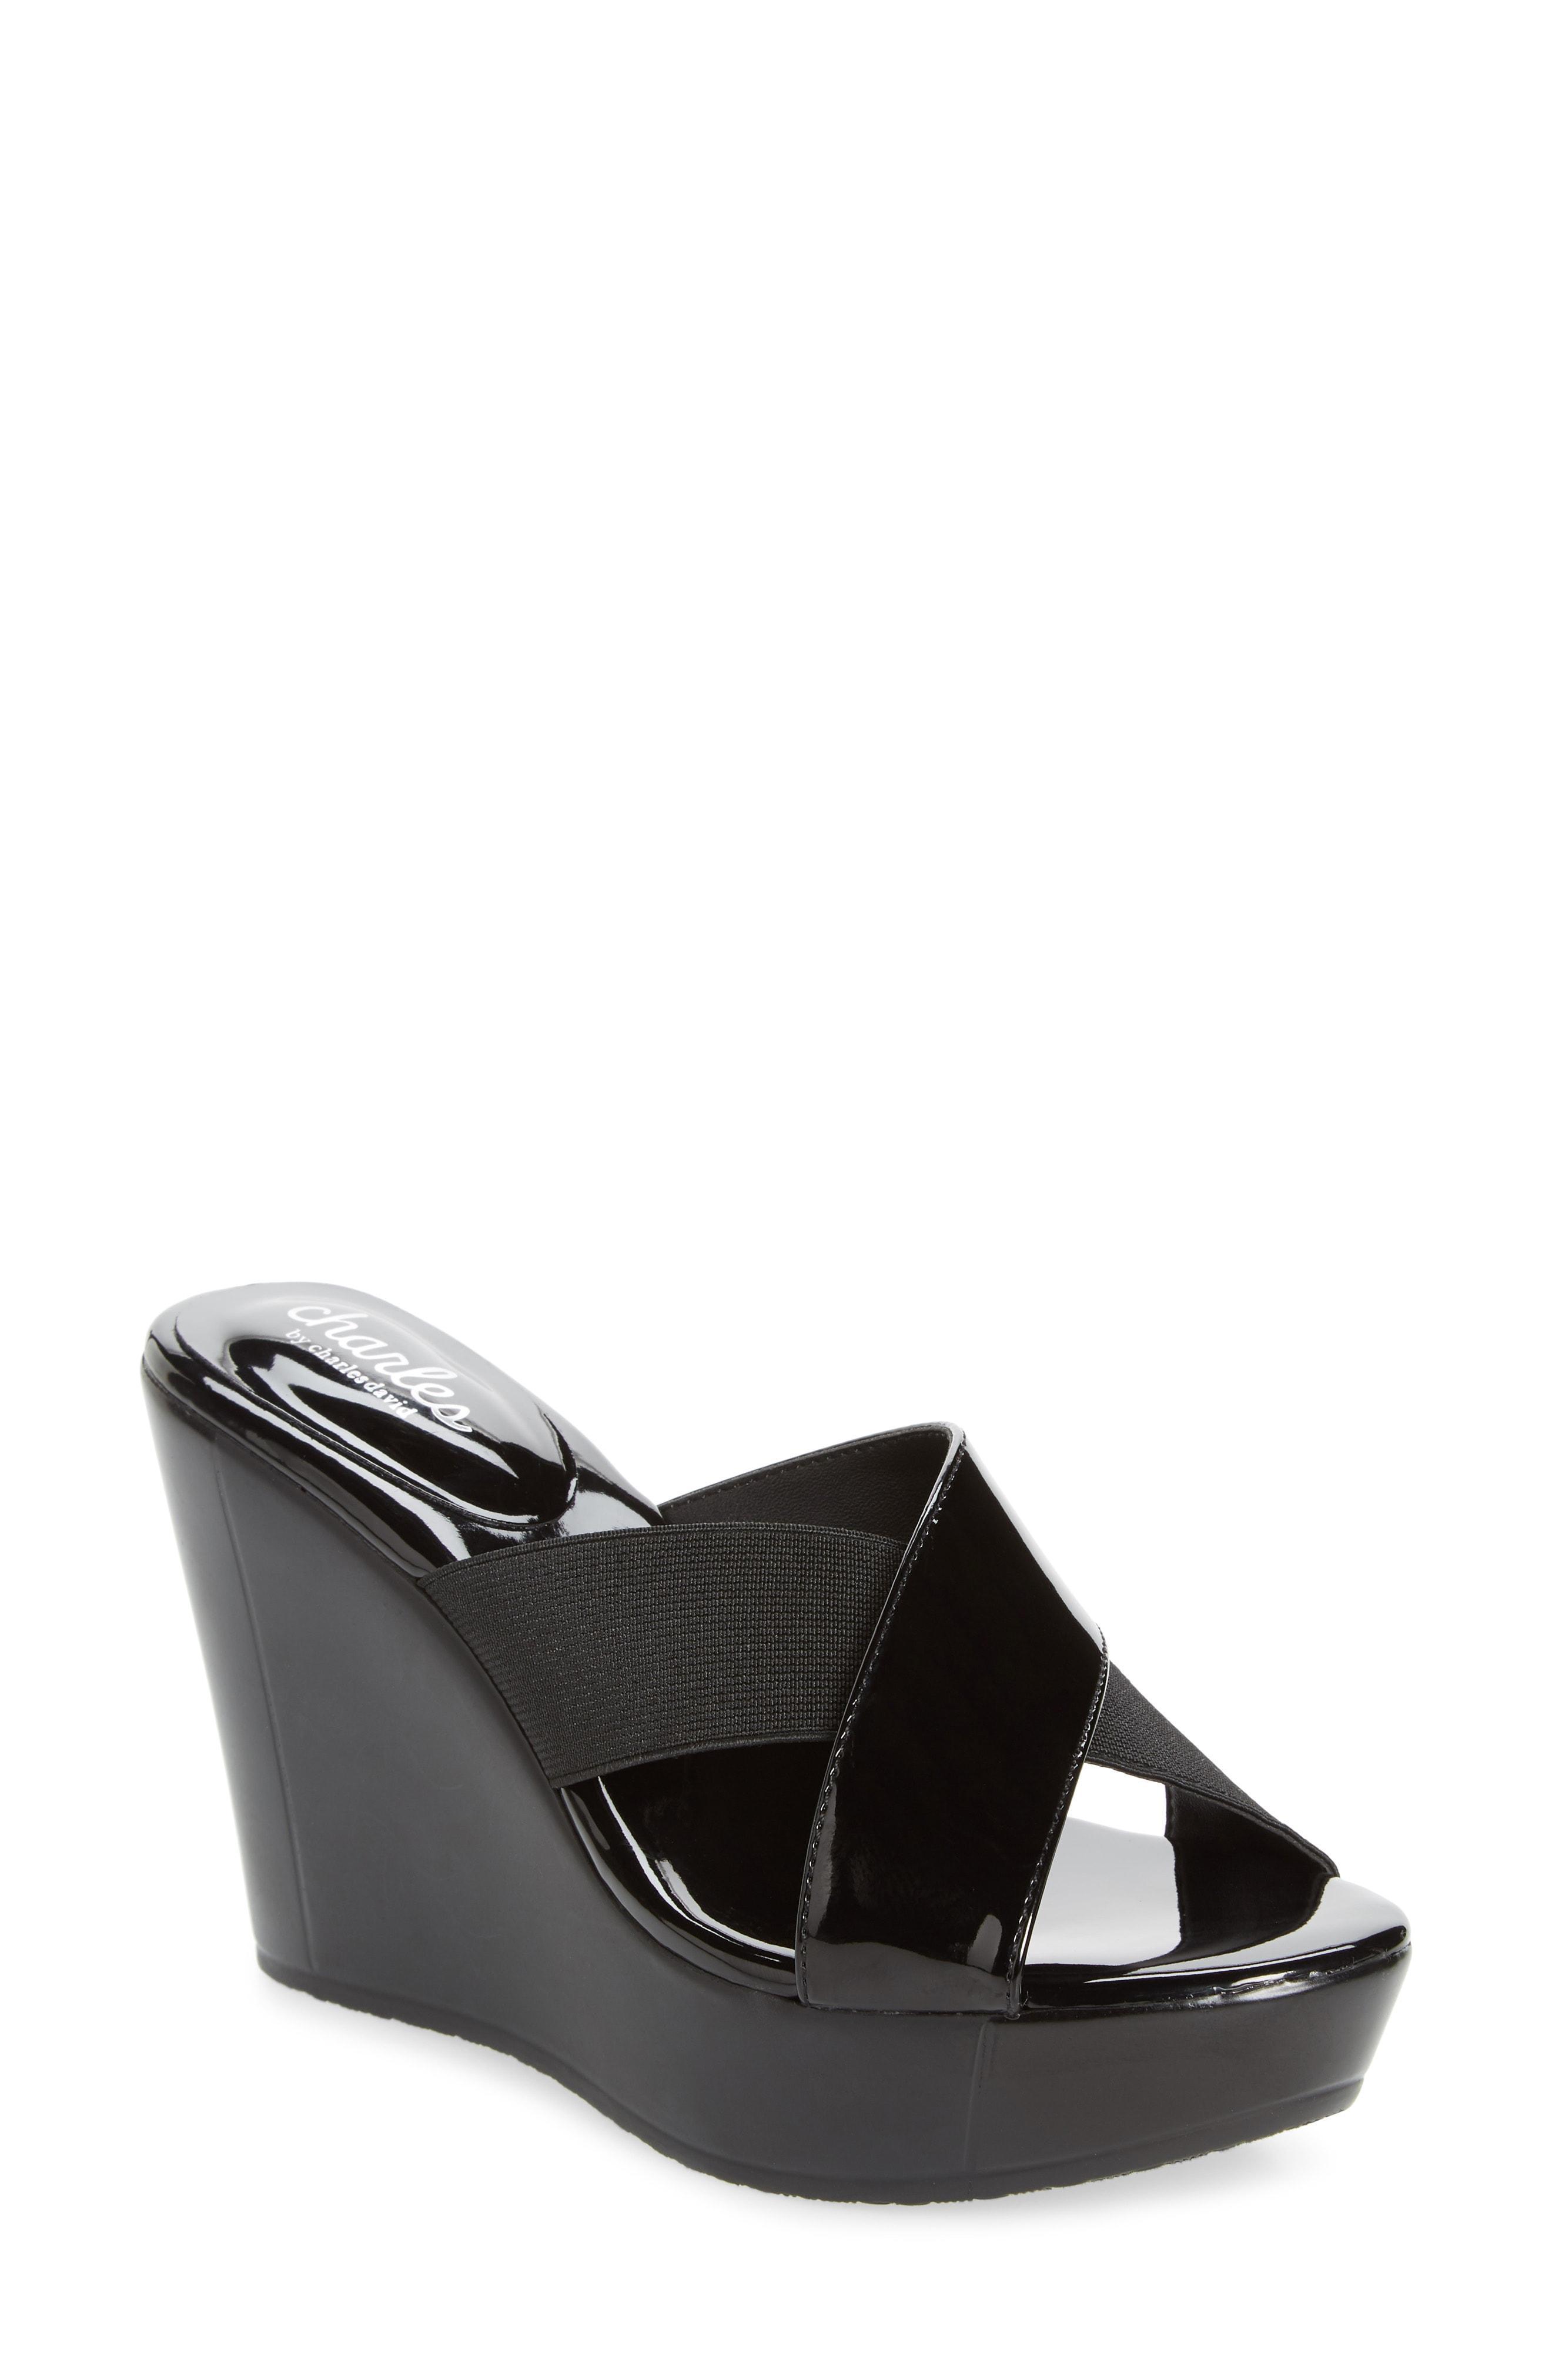 37ba044376a Lyst - Charles David Fuzho Platform Wedge Sandal in Black